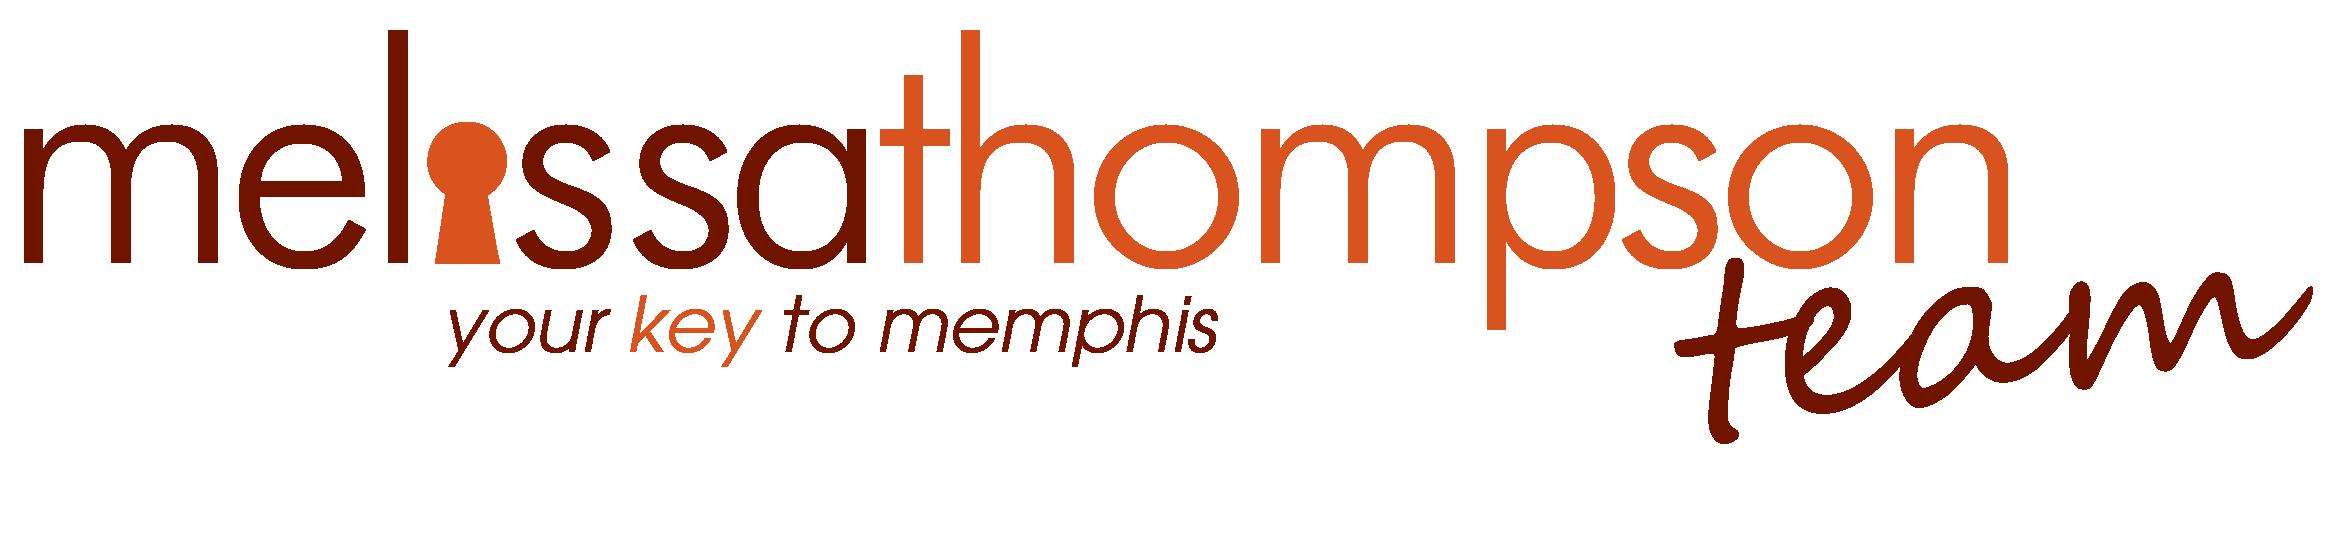 Melissa Thompson- Crye Leike Realtors logo